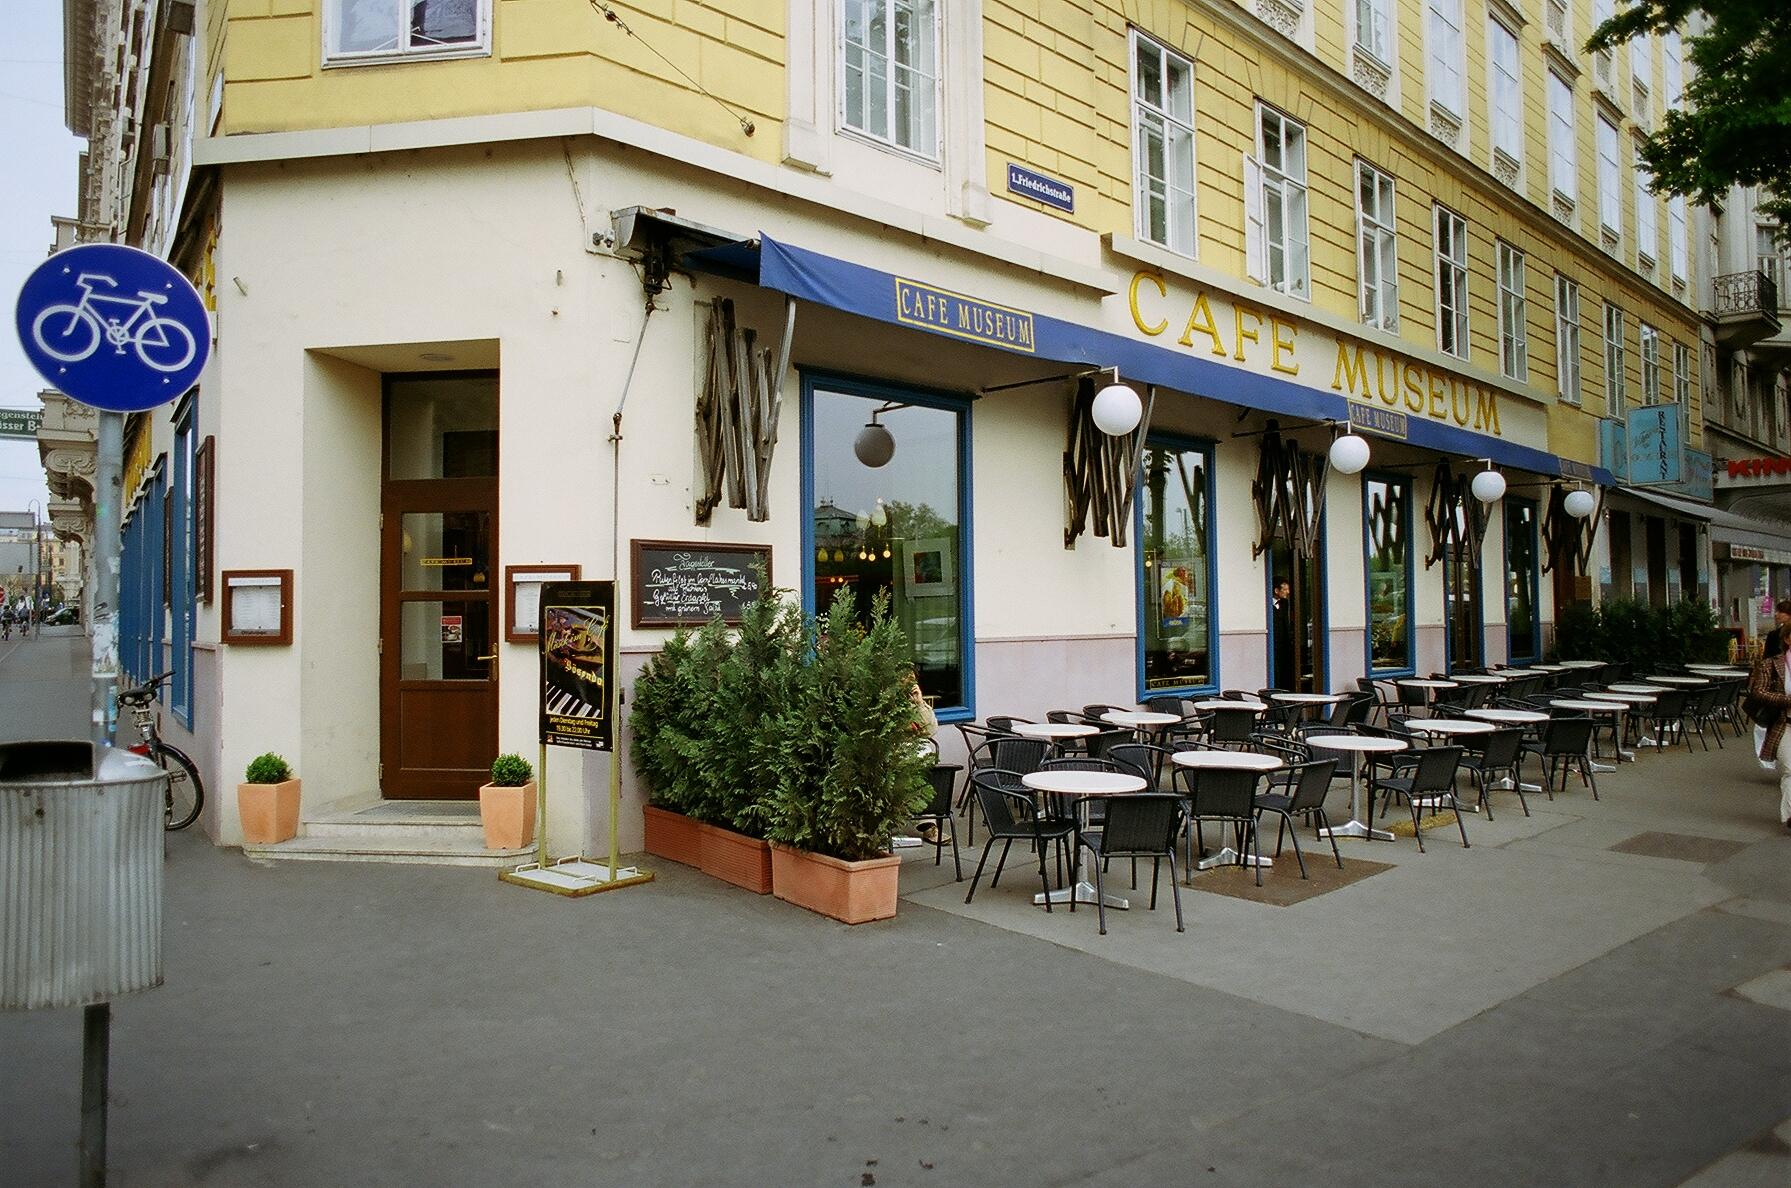 http://upload.wikimedia.org/wikipedia/commons/f/f8/Cafe-Museum-Vienna-04-07.JPG